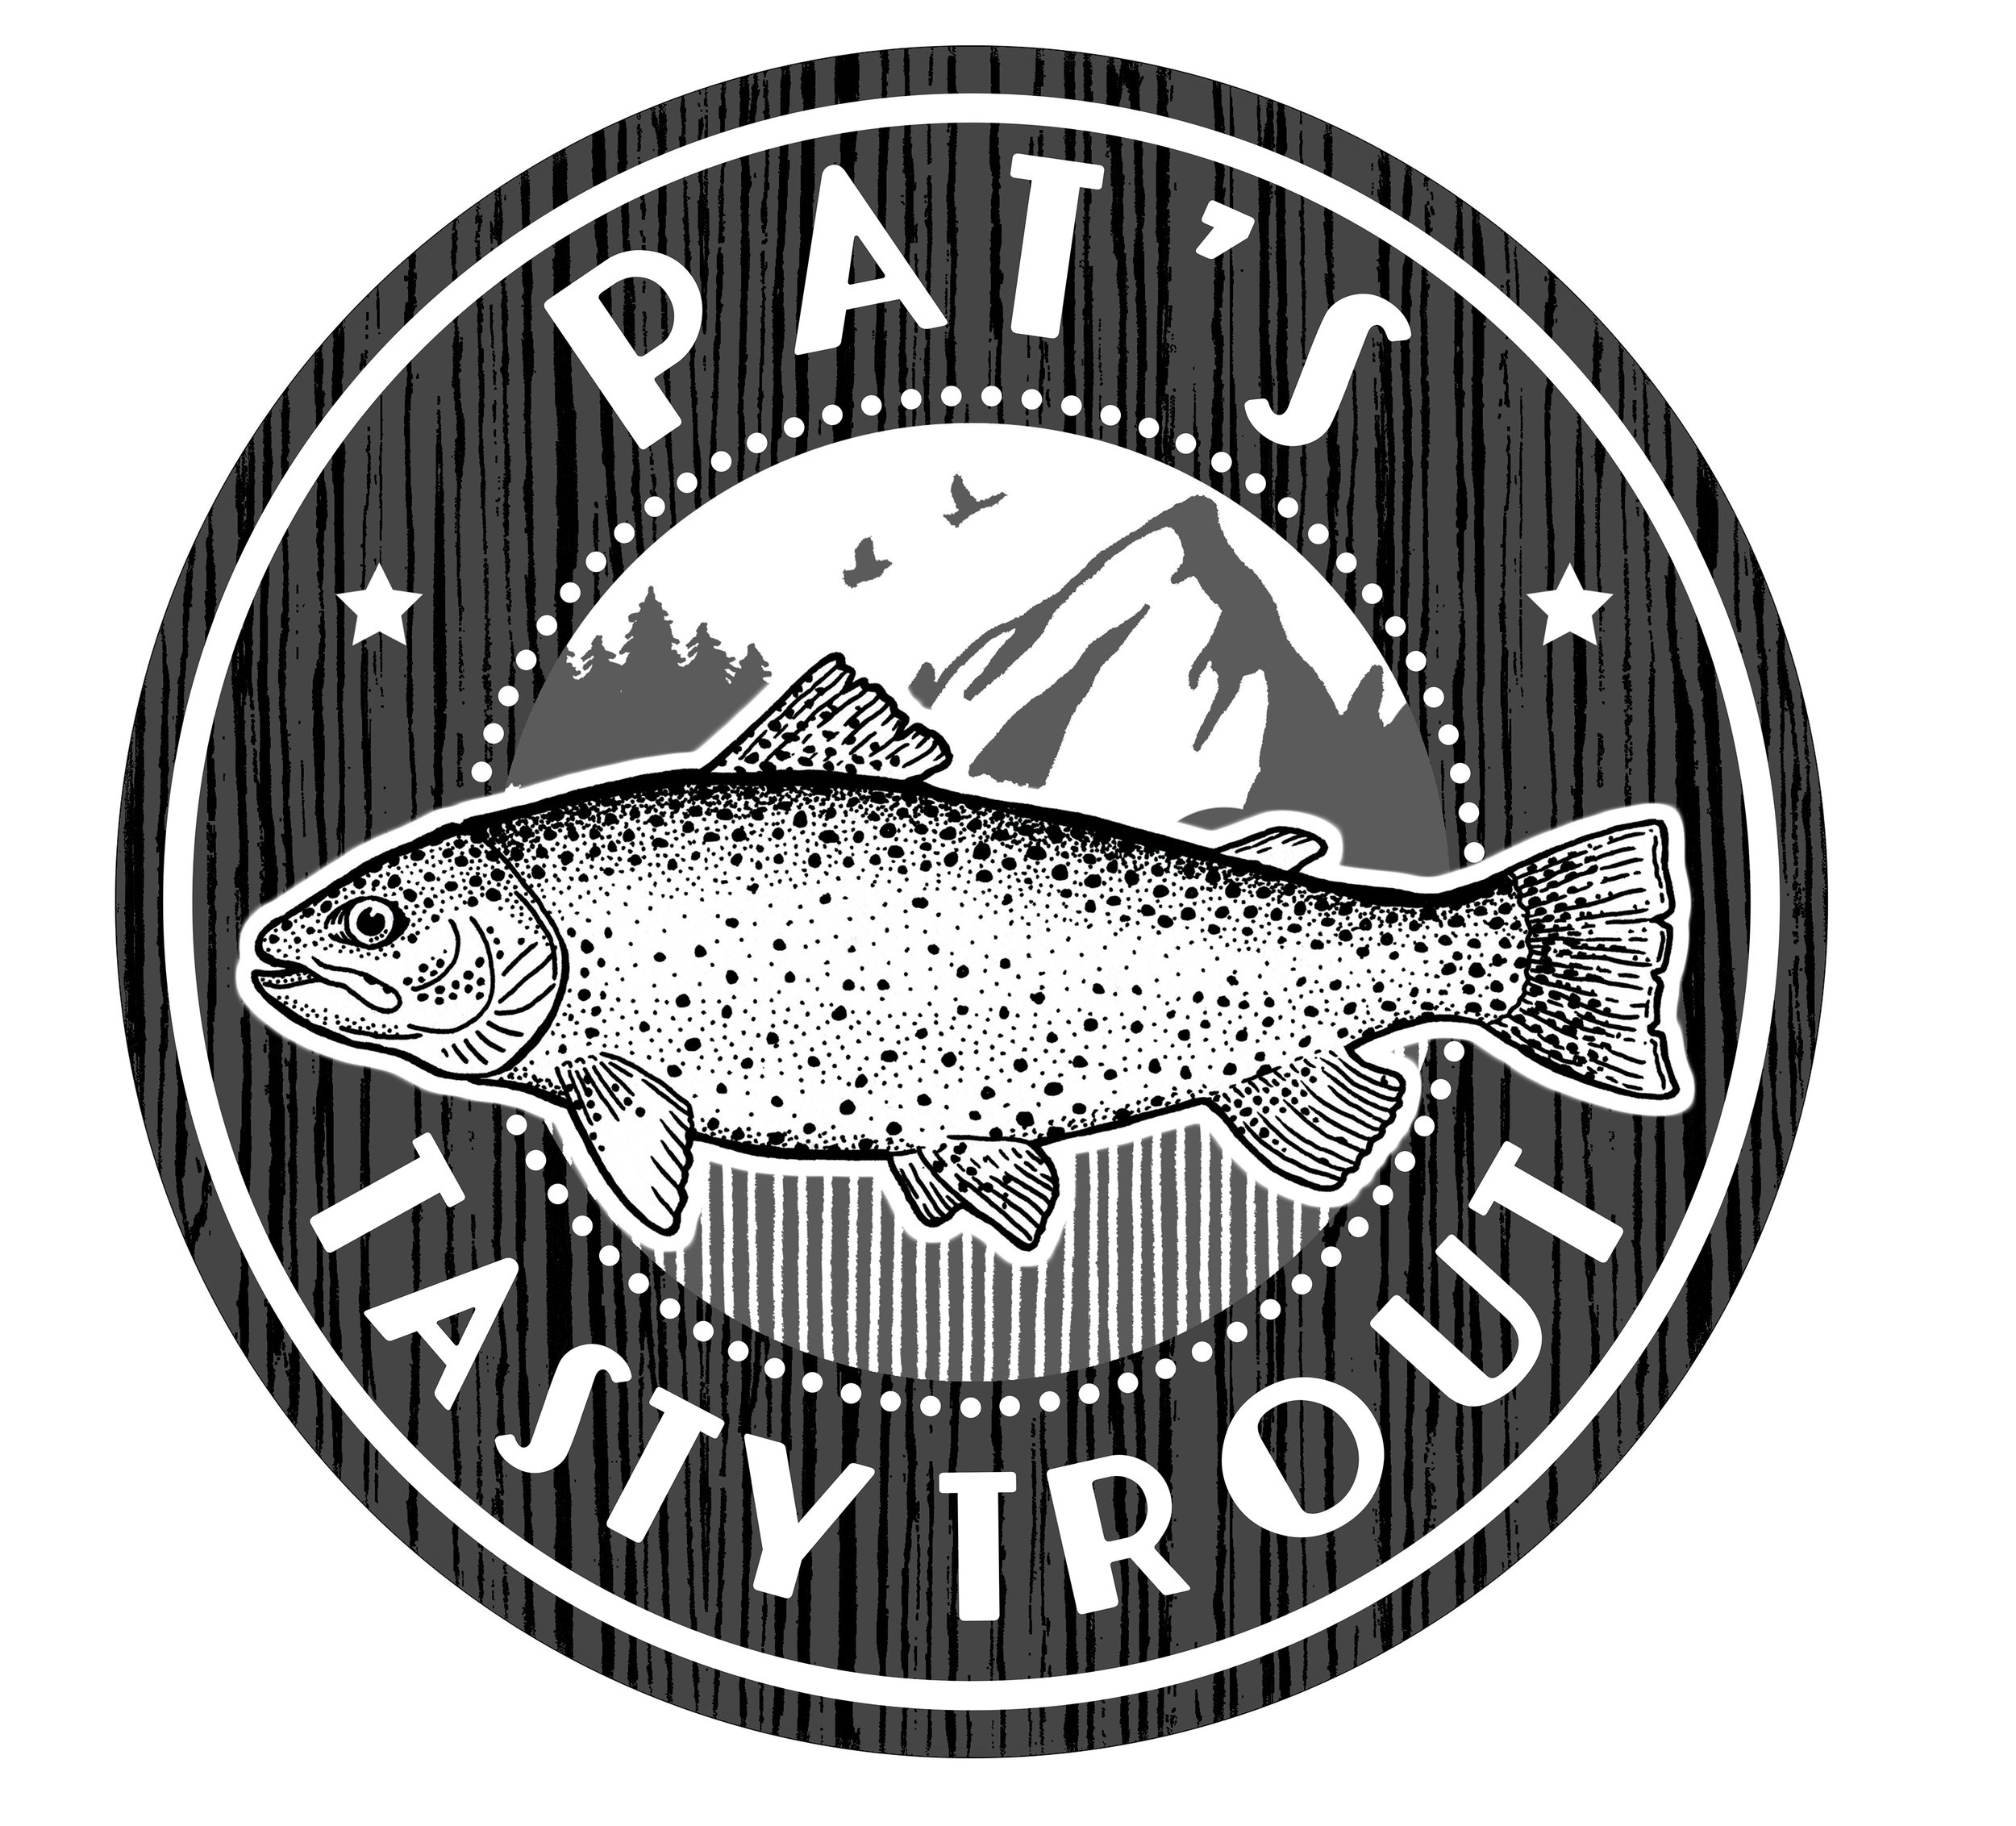 Q+F_PatsTastyTrout5.jpg